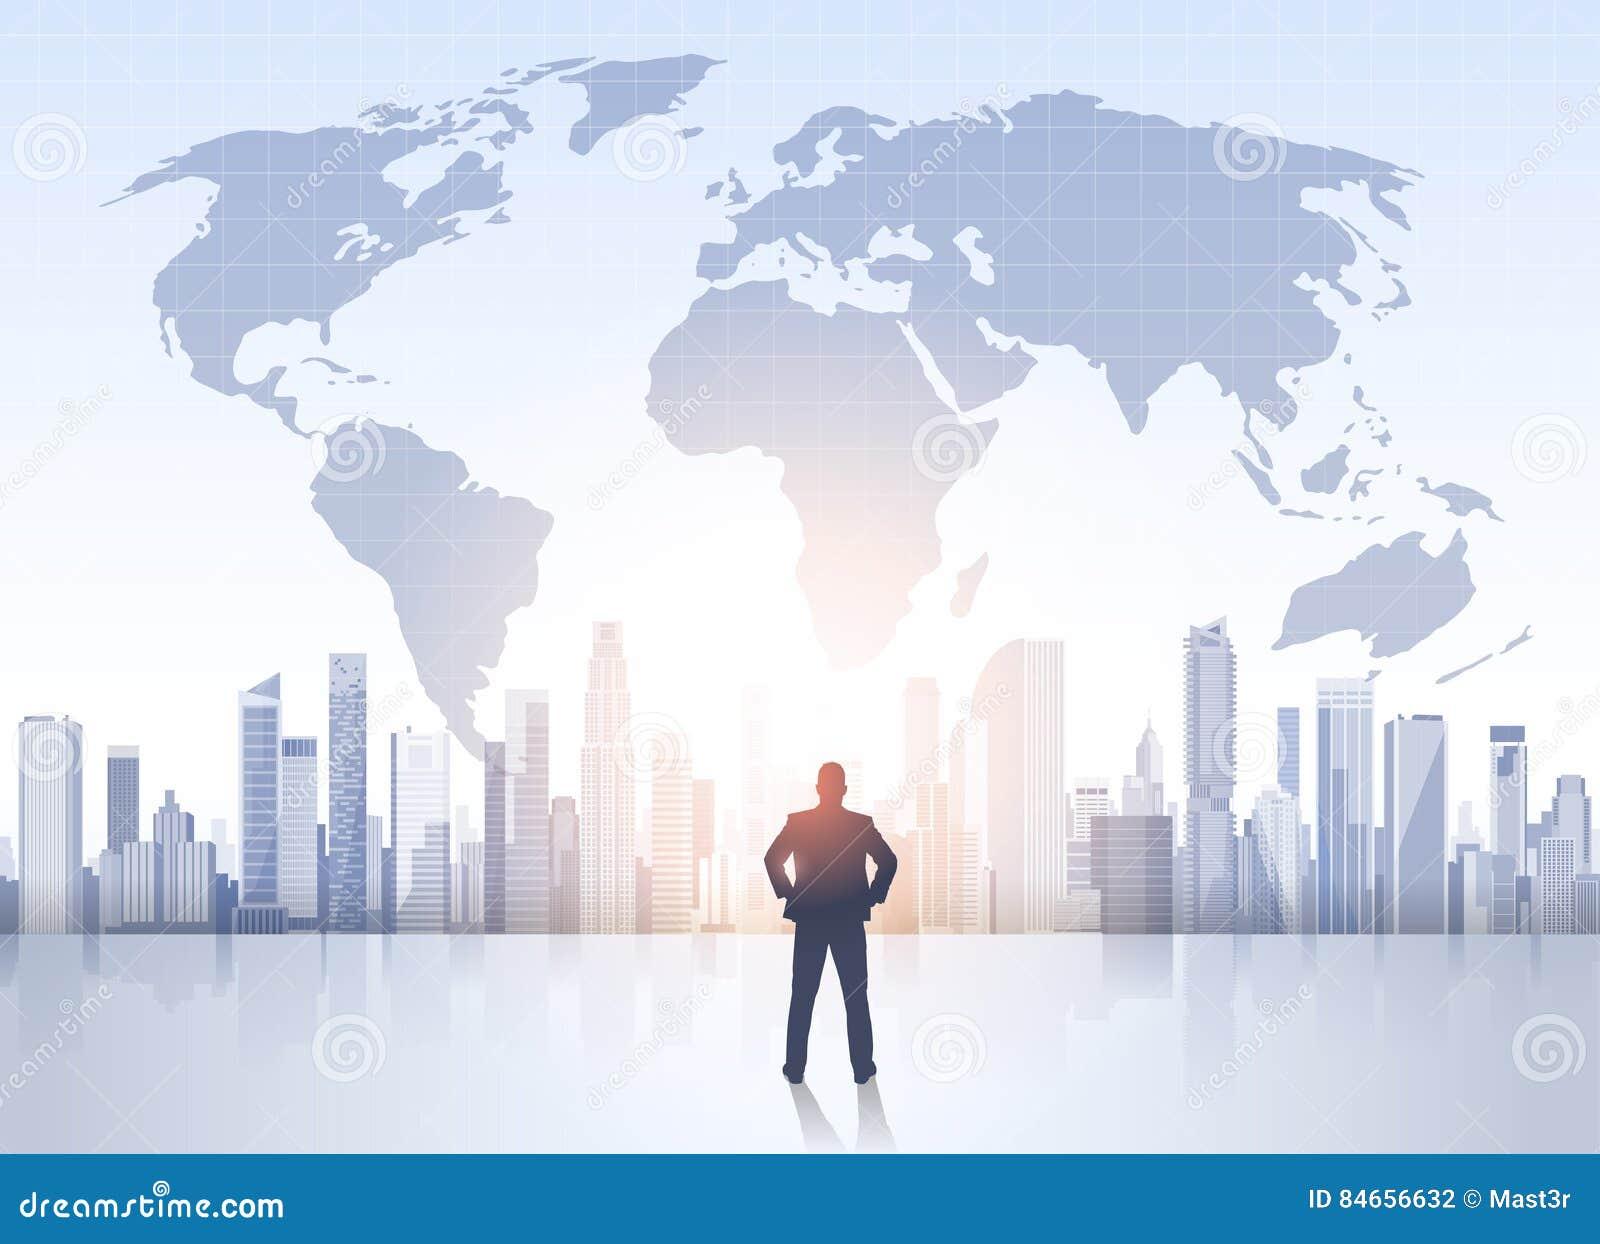 Business man silhouette over city landscape world map modern office business man silhouette over city landscape world map modern office buildings gumiabroncs Images